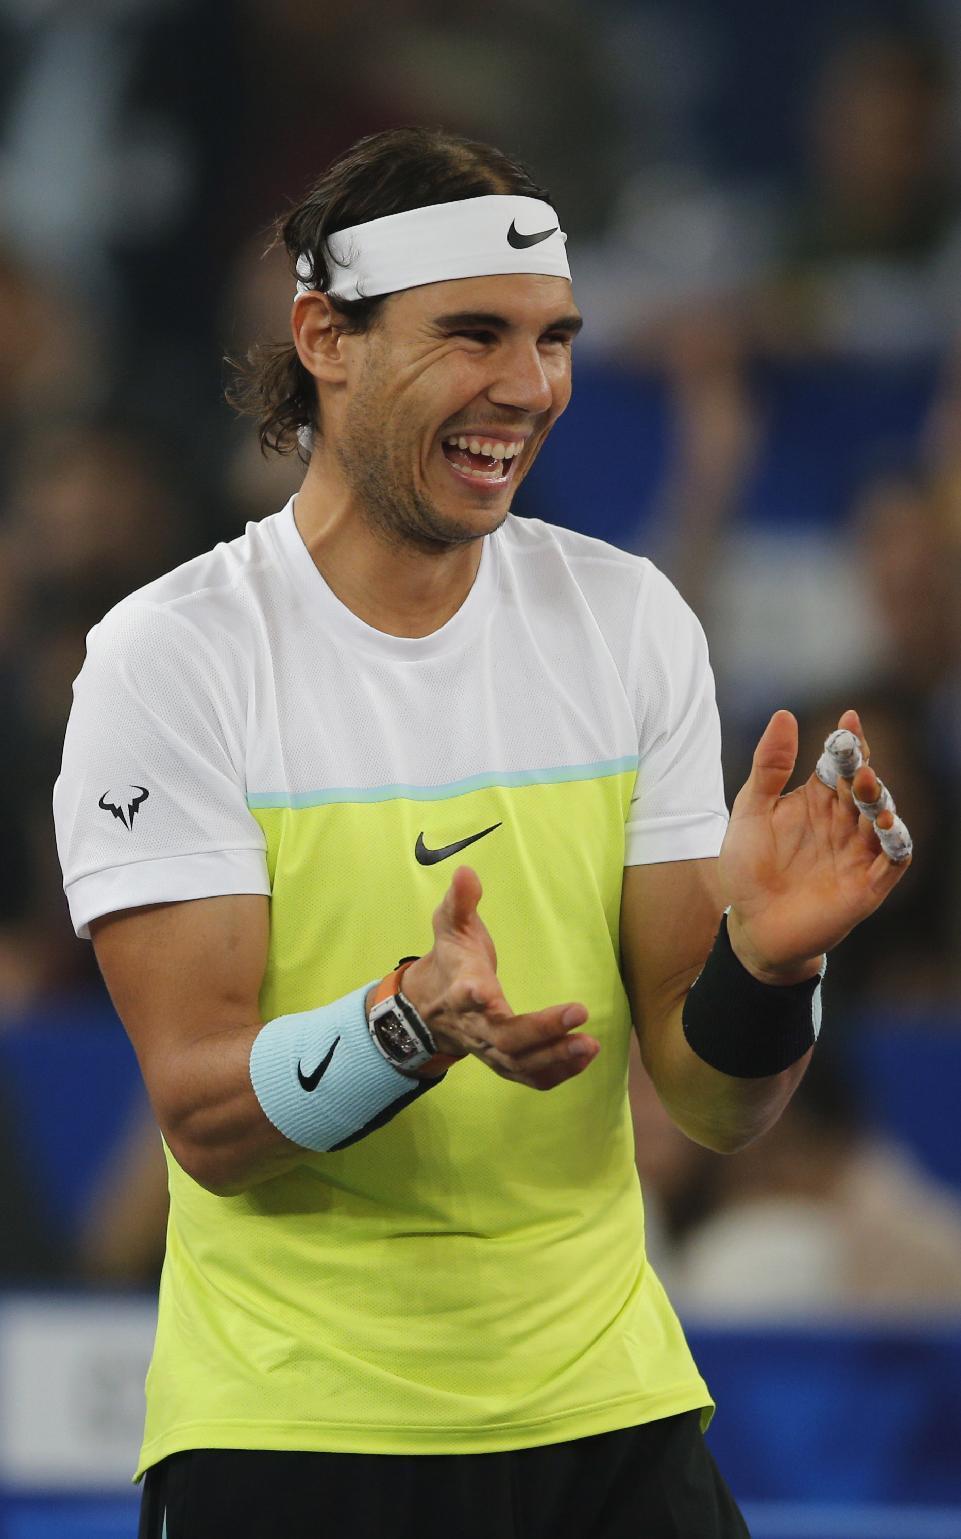 IPTL 2015: Rafael Nadal beats Roger Federer in New Delhi [PHOTOS] – Rafael Nadal Fans